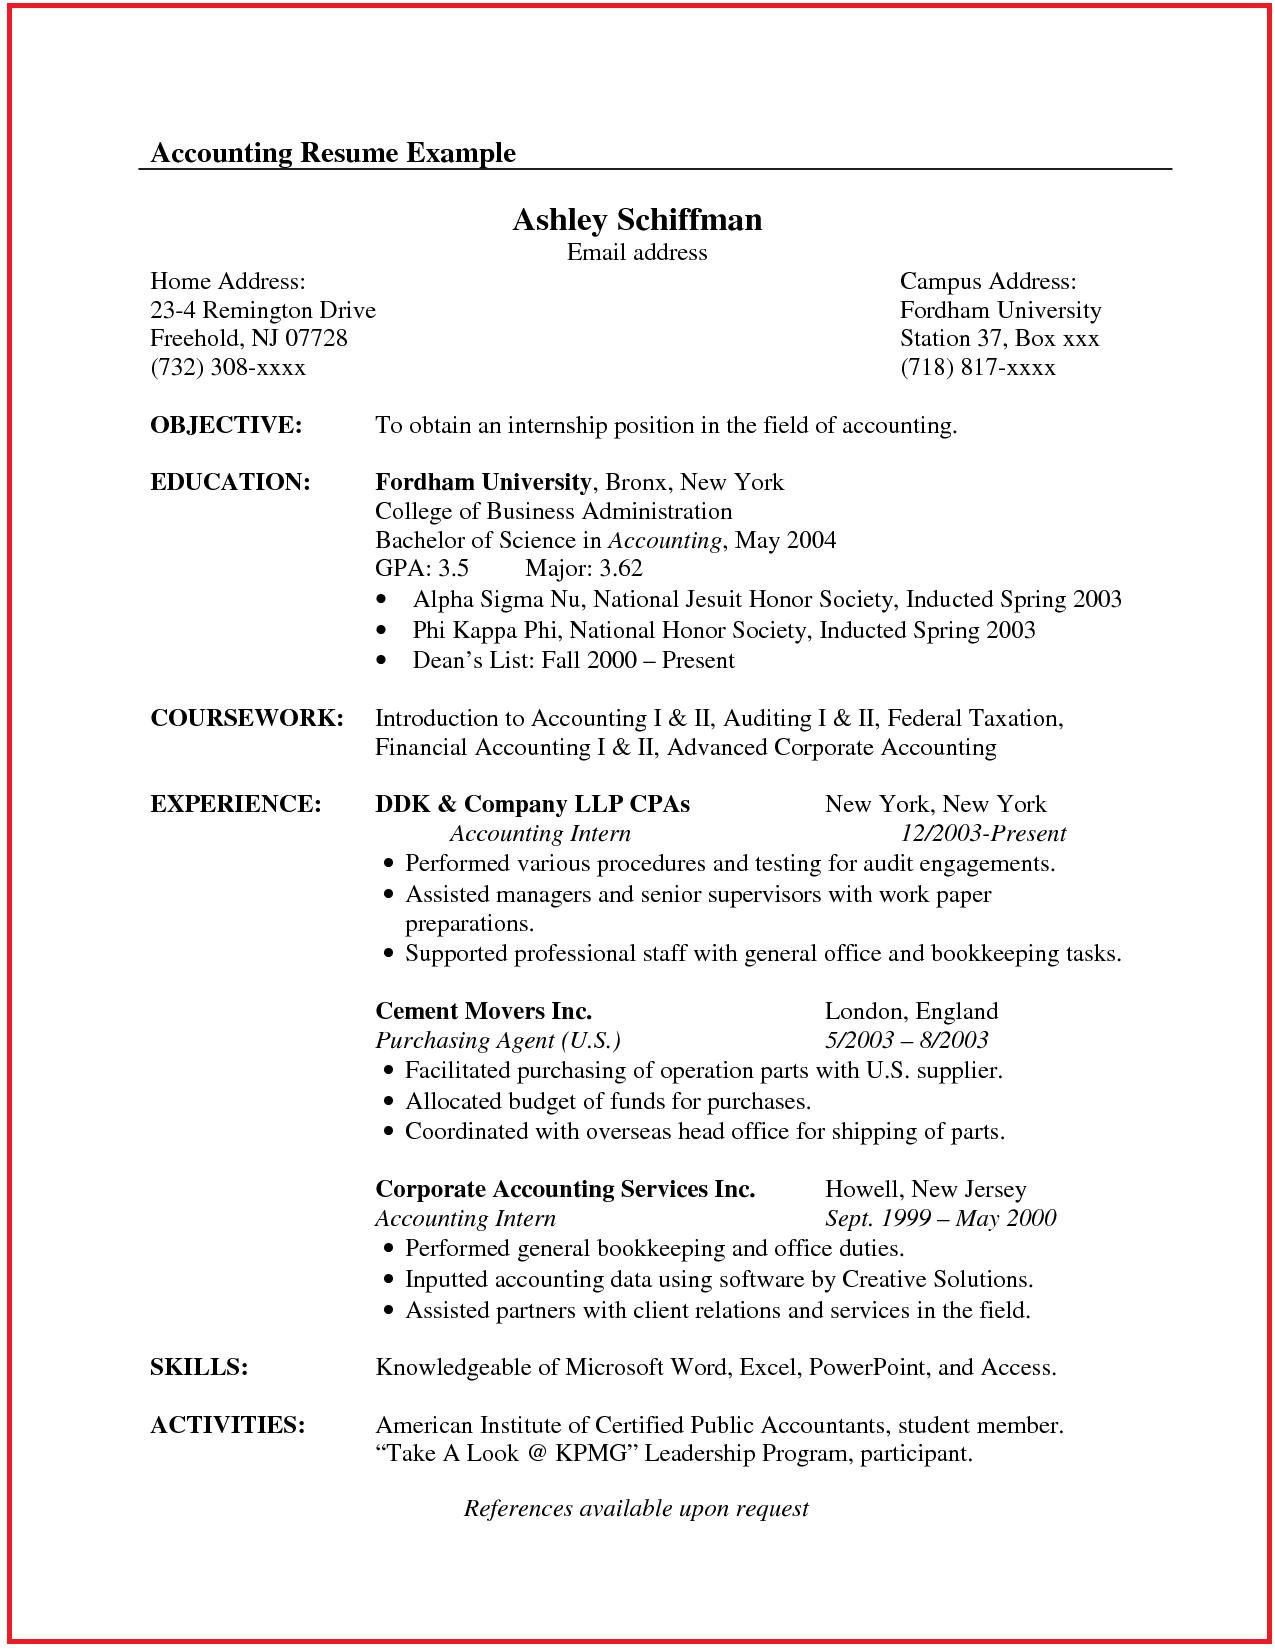 Accountant Resume Sample Canada Internship Resume Accountant Resume Resume Examples